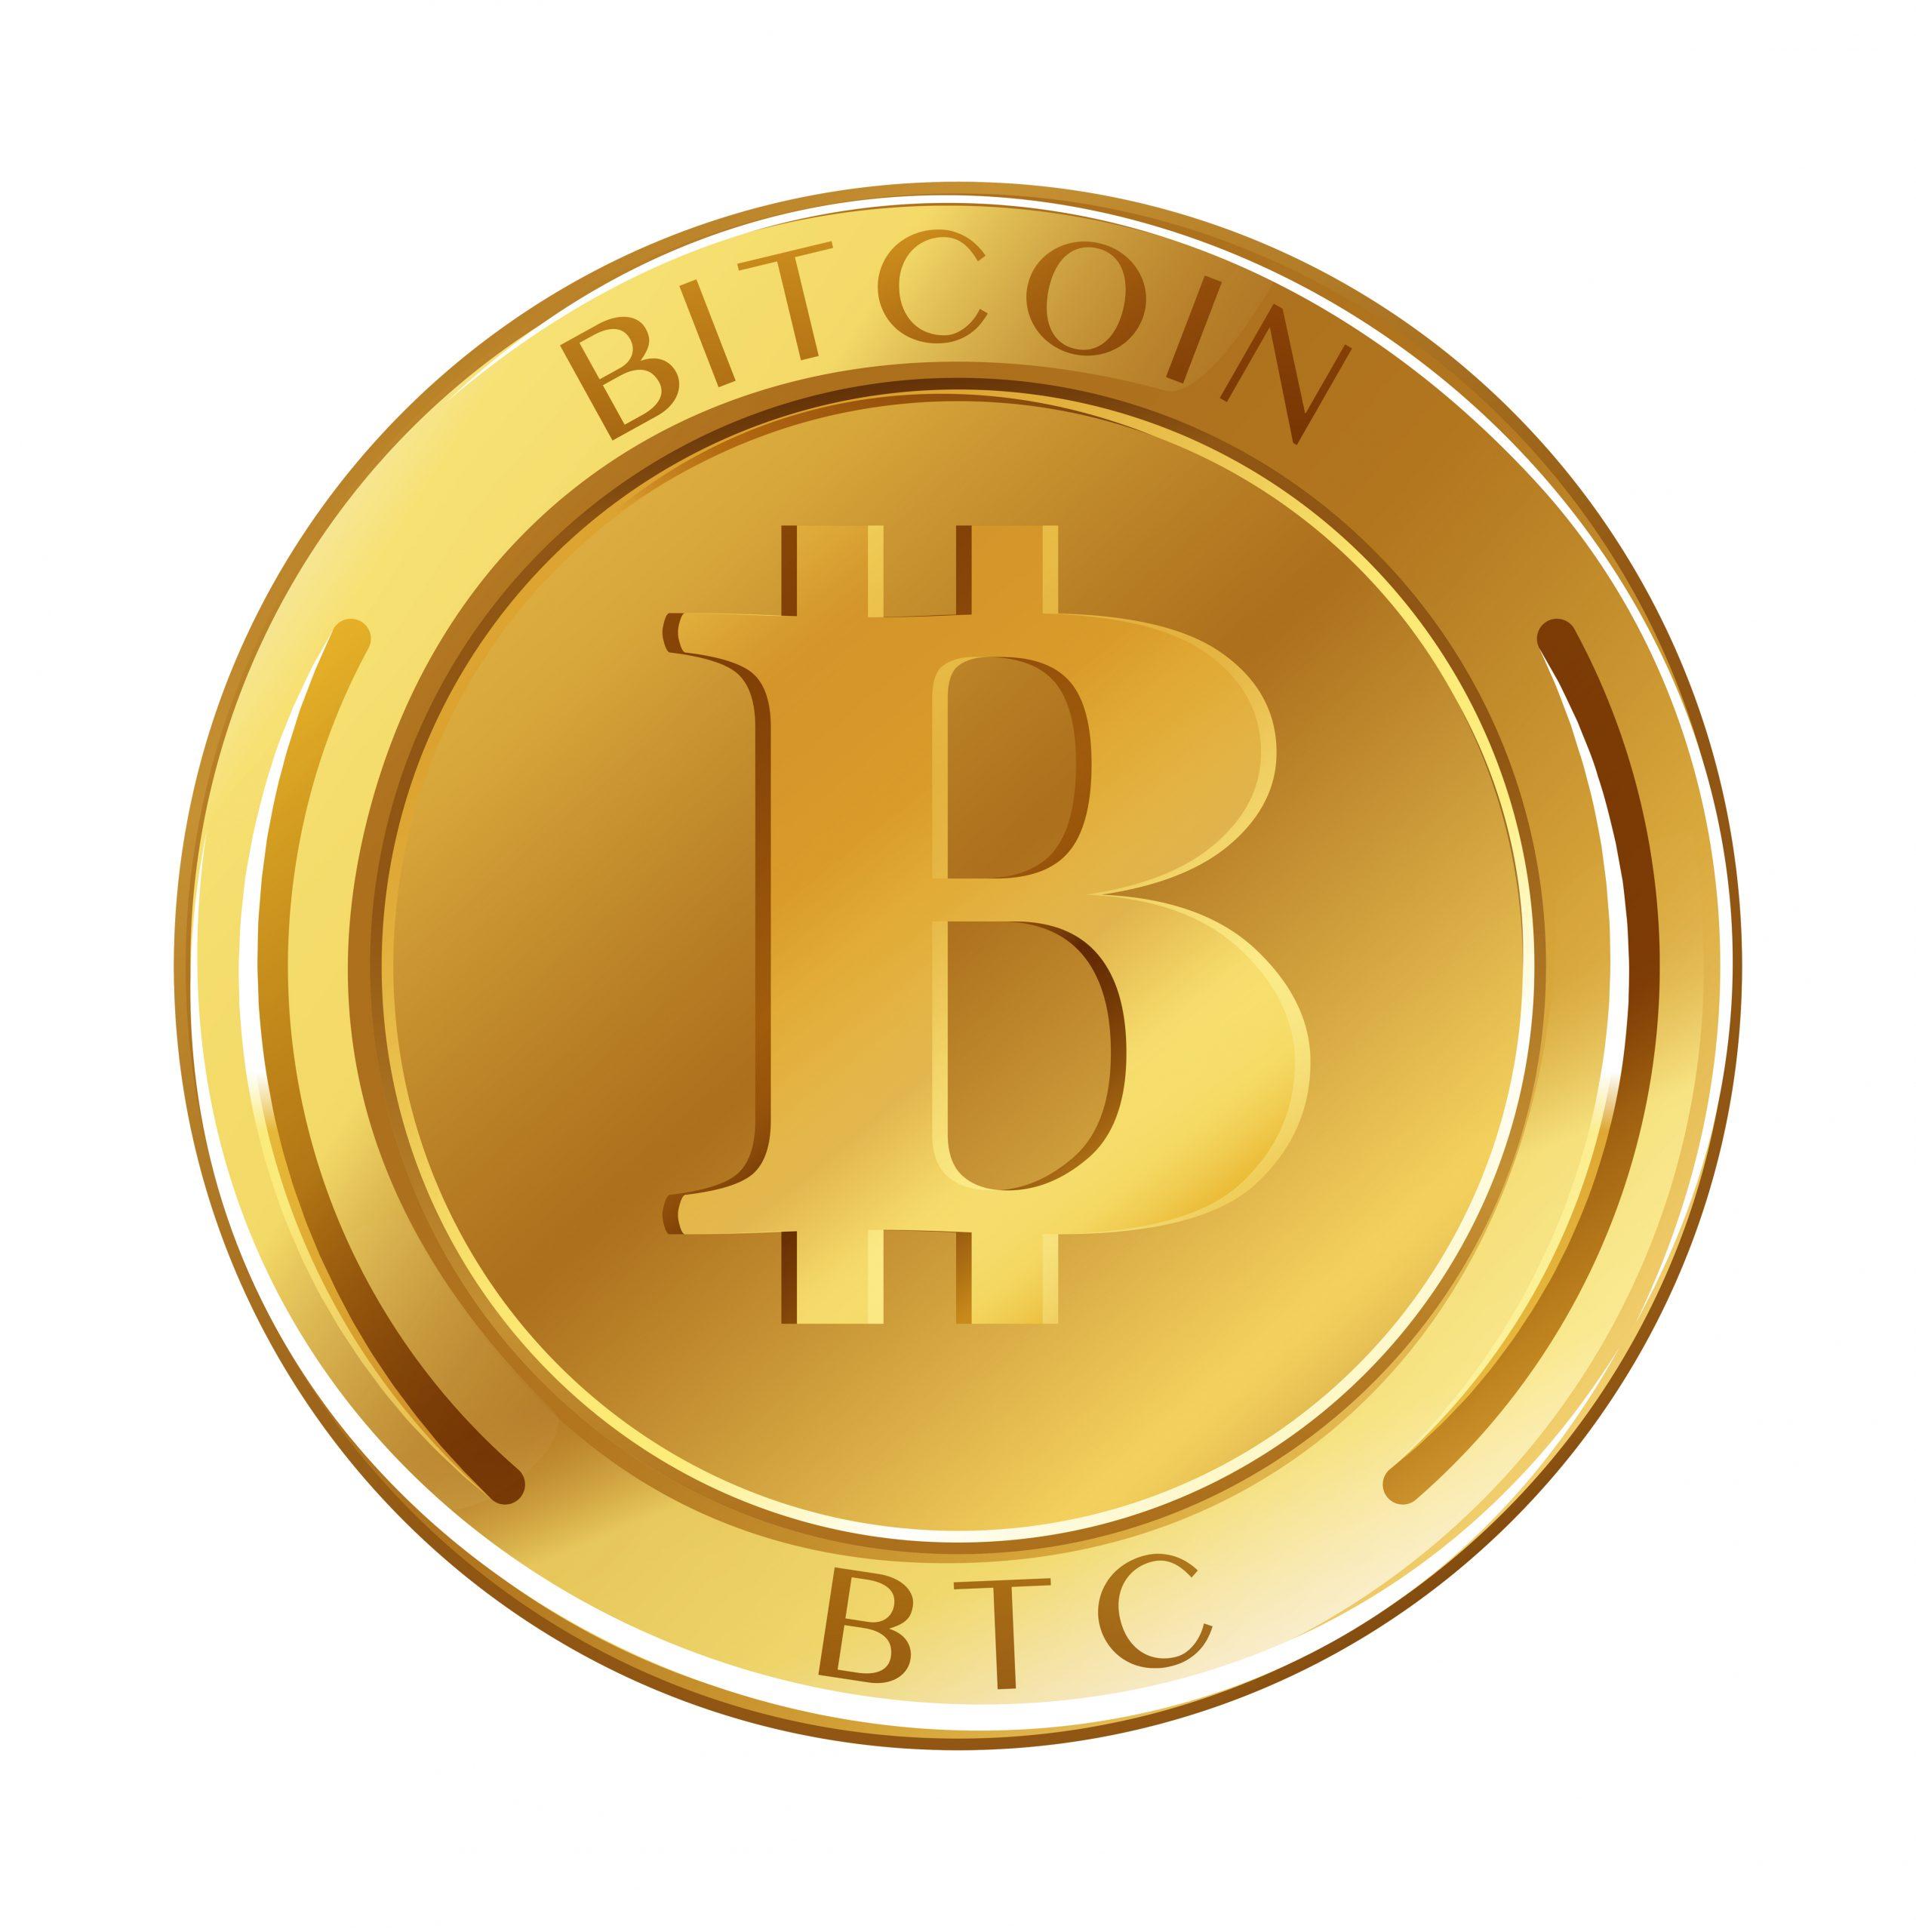 ByBit Bitcoin Wallet 1B4czjEe49oHQZGr2g5DGLjkuNH3dUWp6v